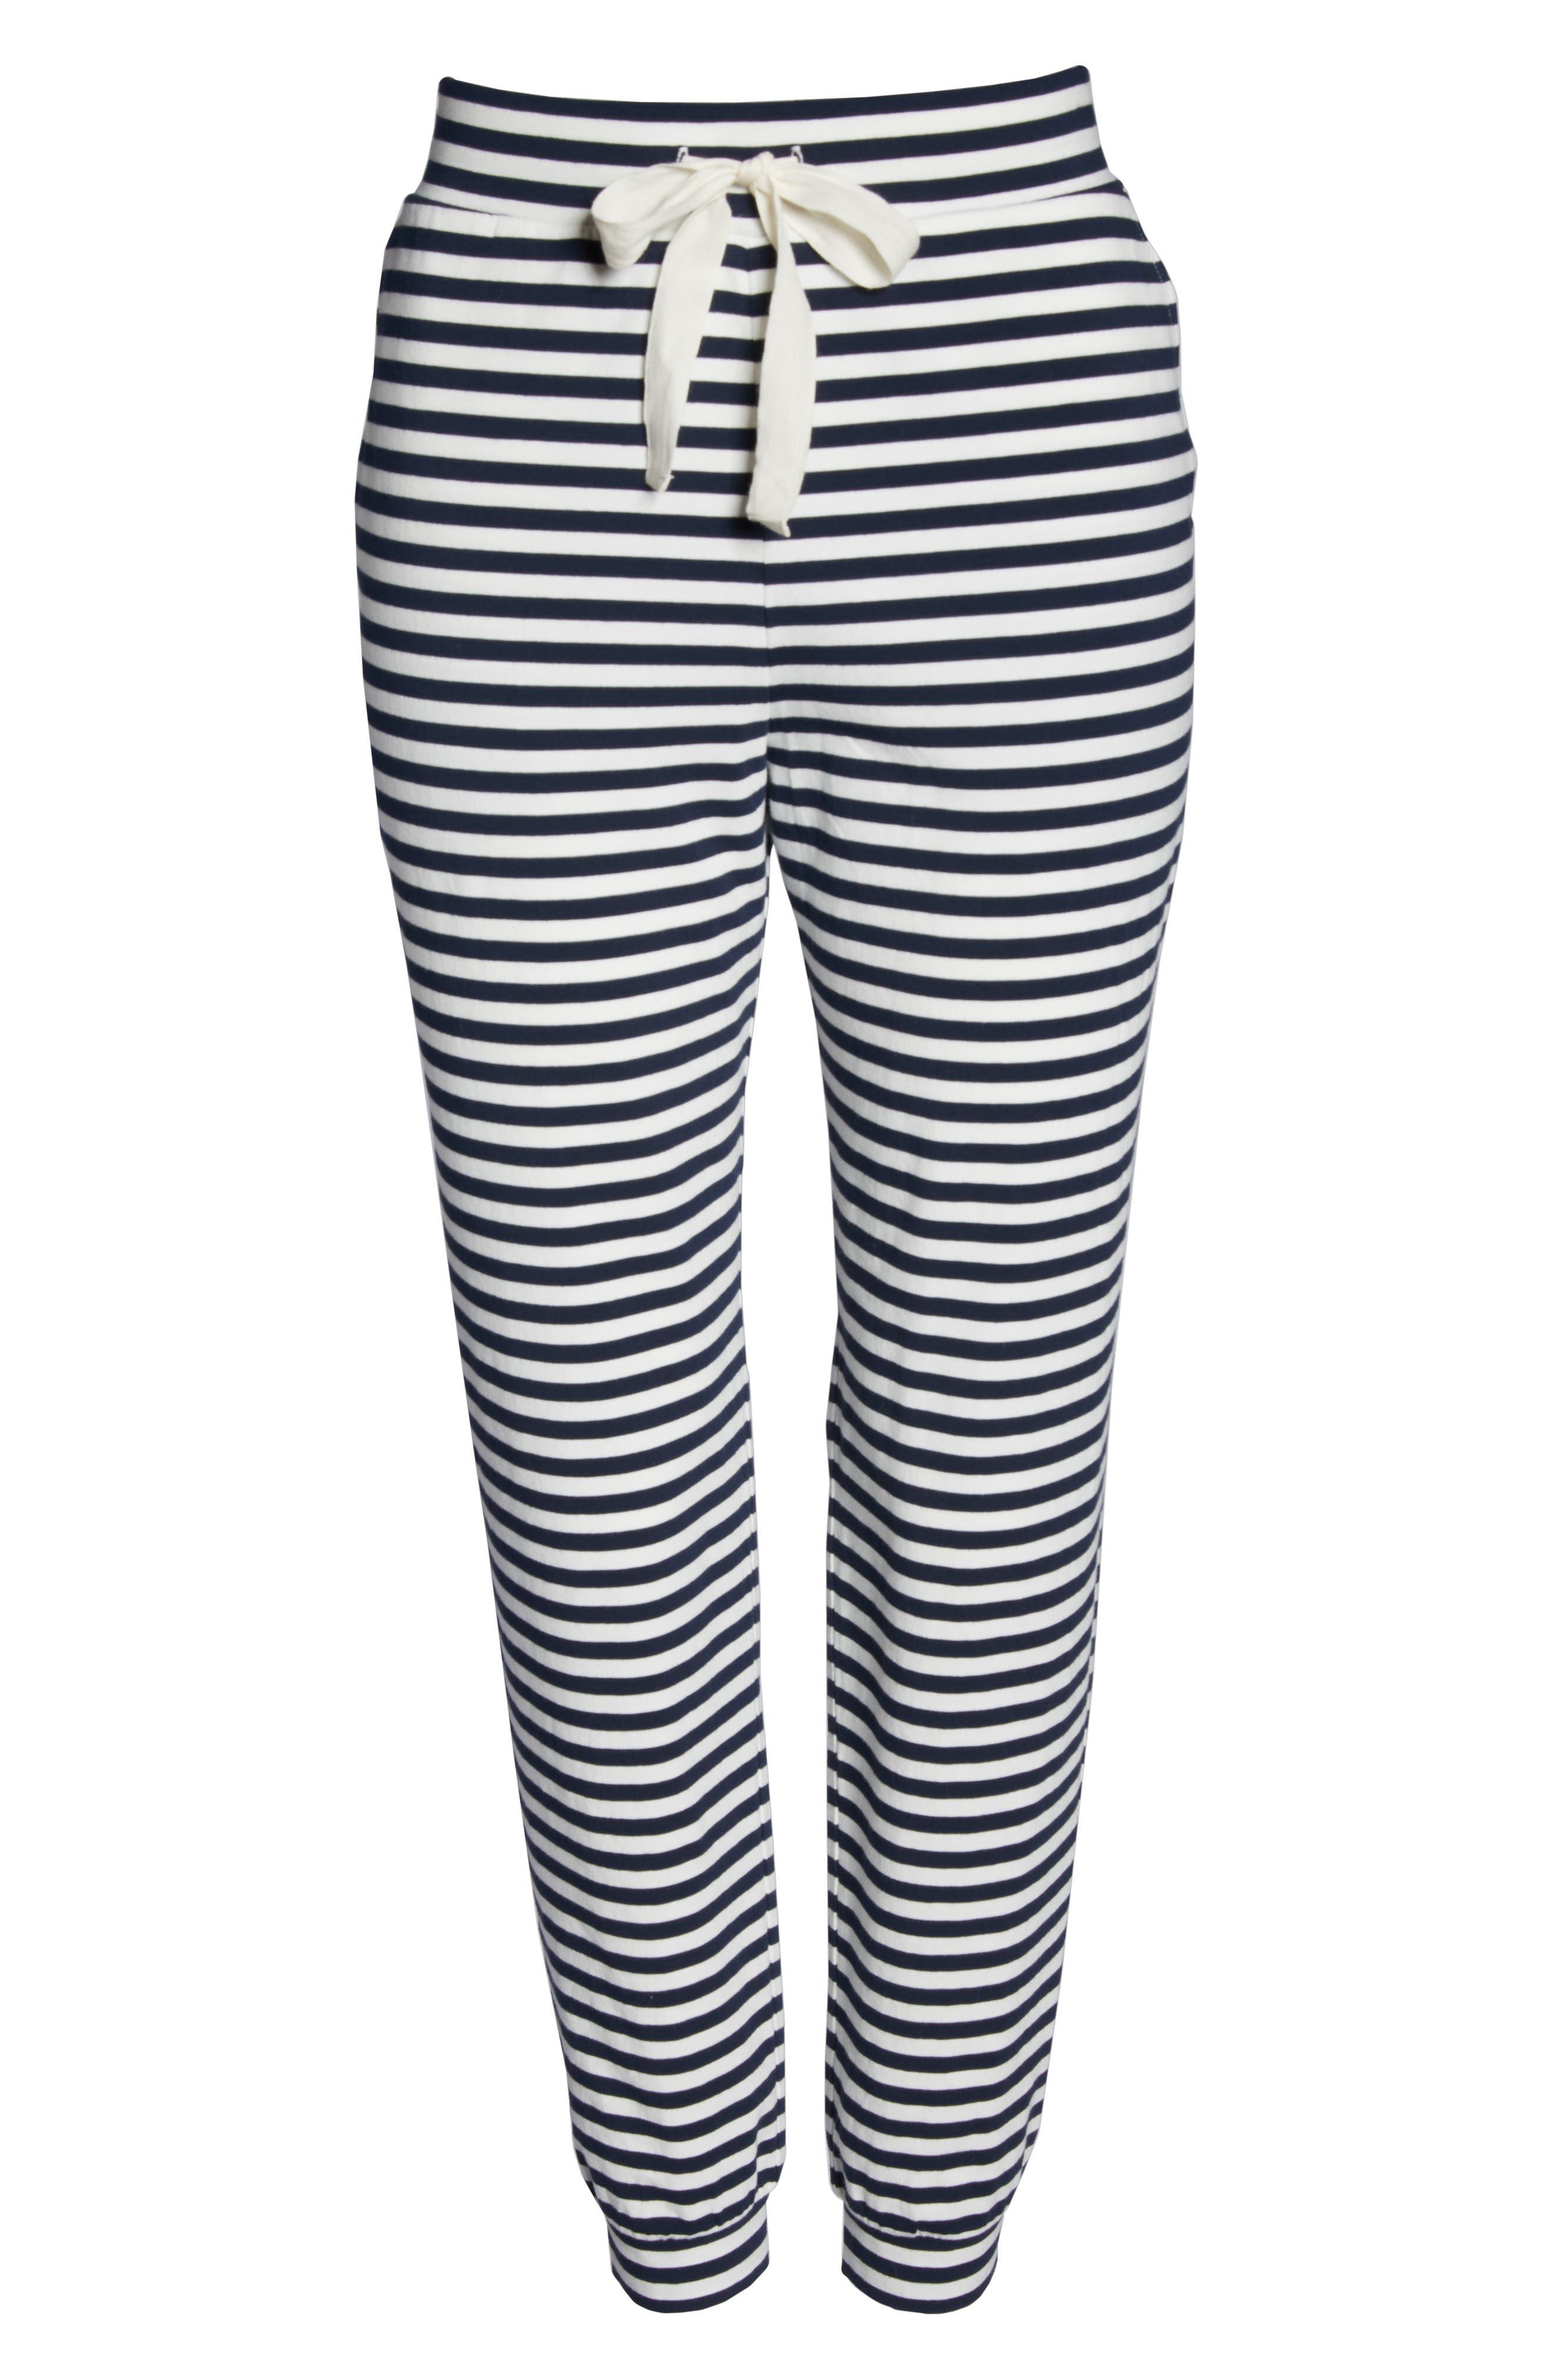 Dreamy Stripe Pajama Jogger Pants,                             Alternate thumbnail 6, color,                             IVORY NAVY